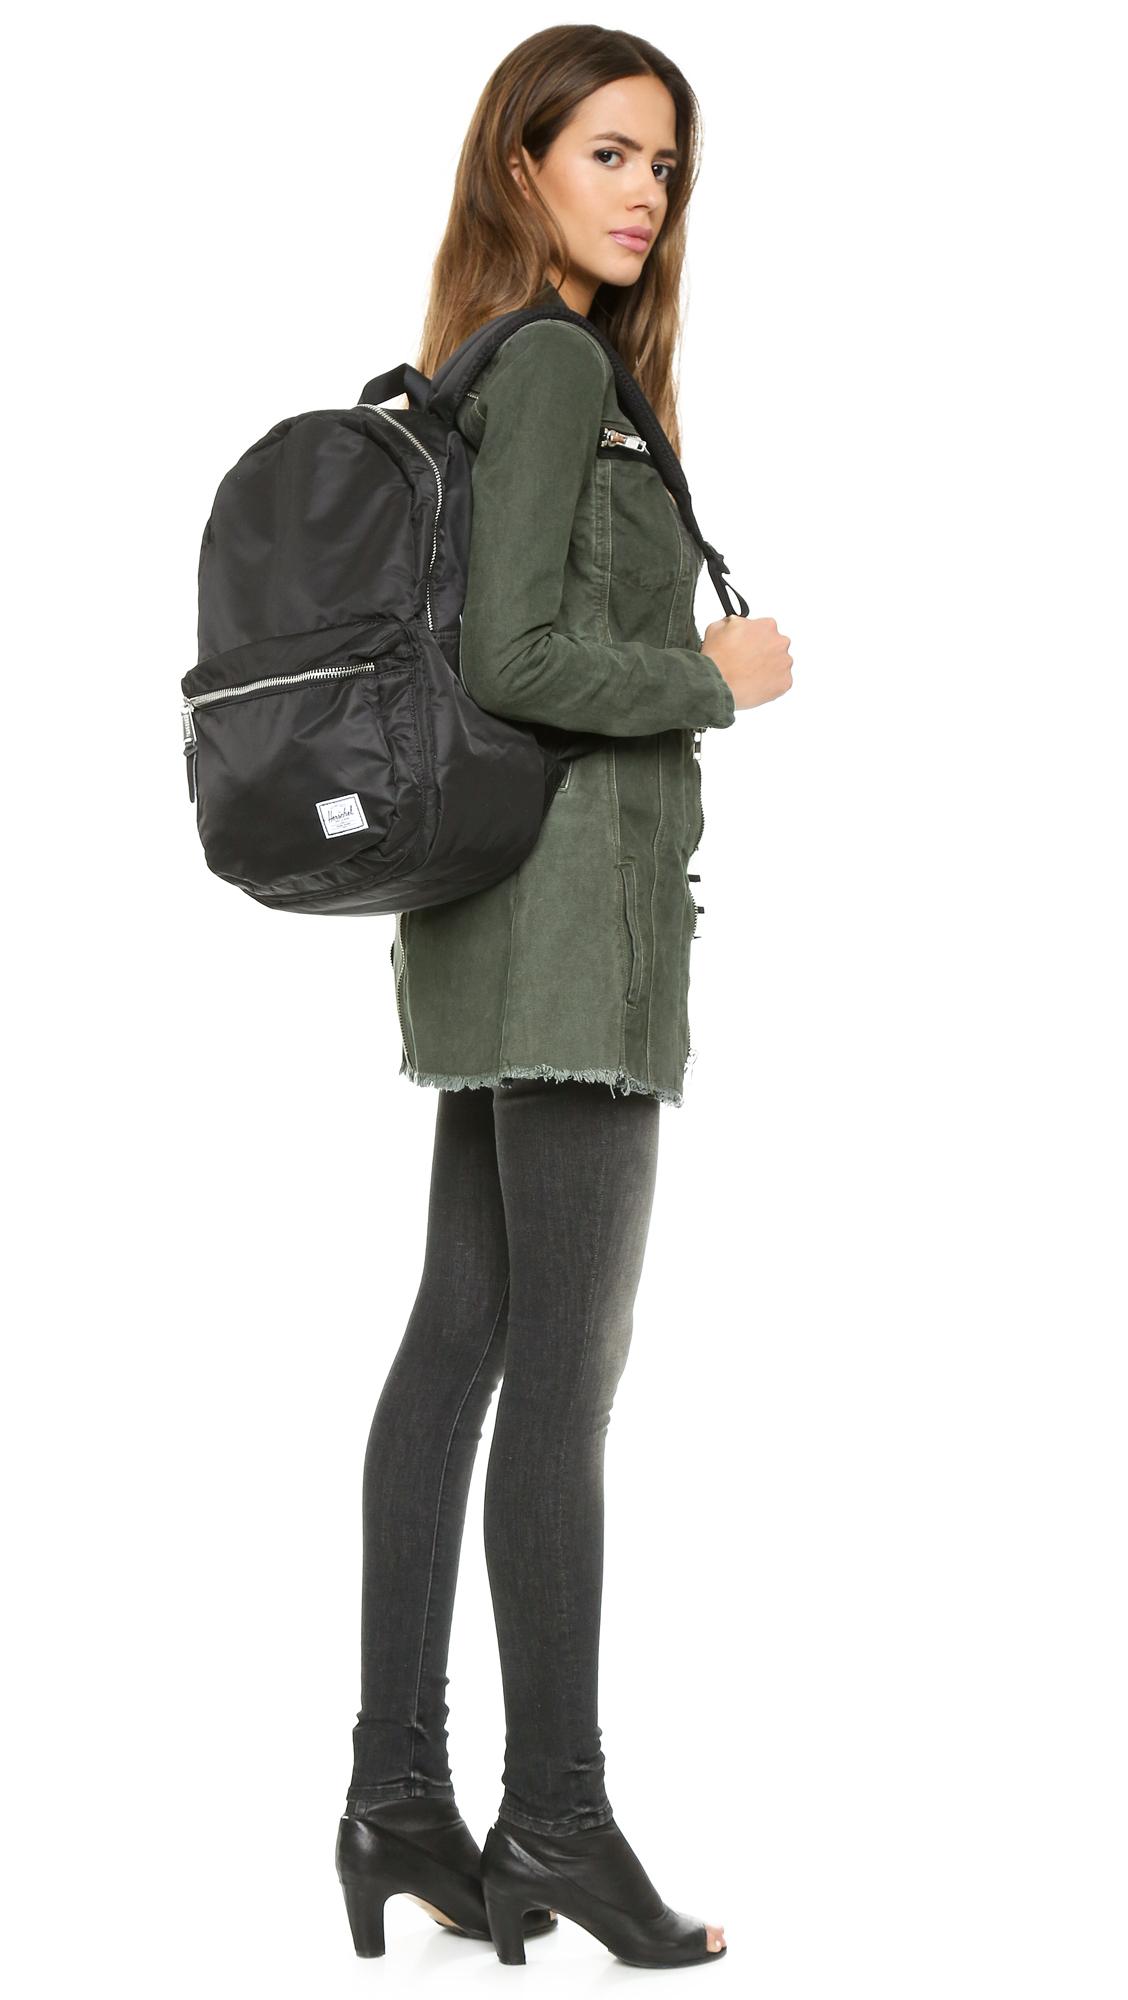 dc62e4b75c Herschel Supply Co. Lawson Backpack